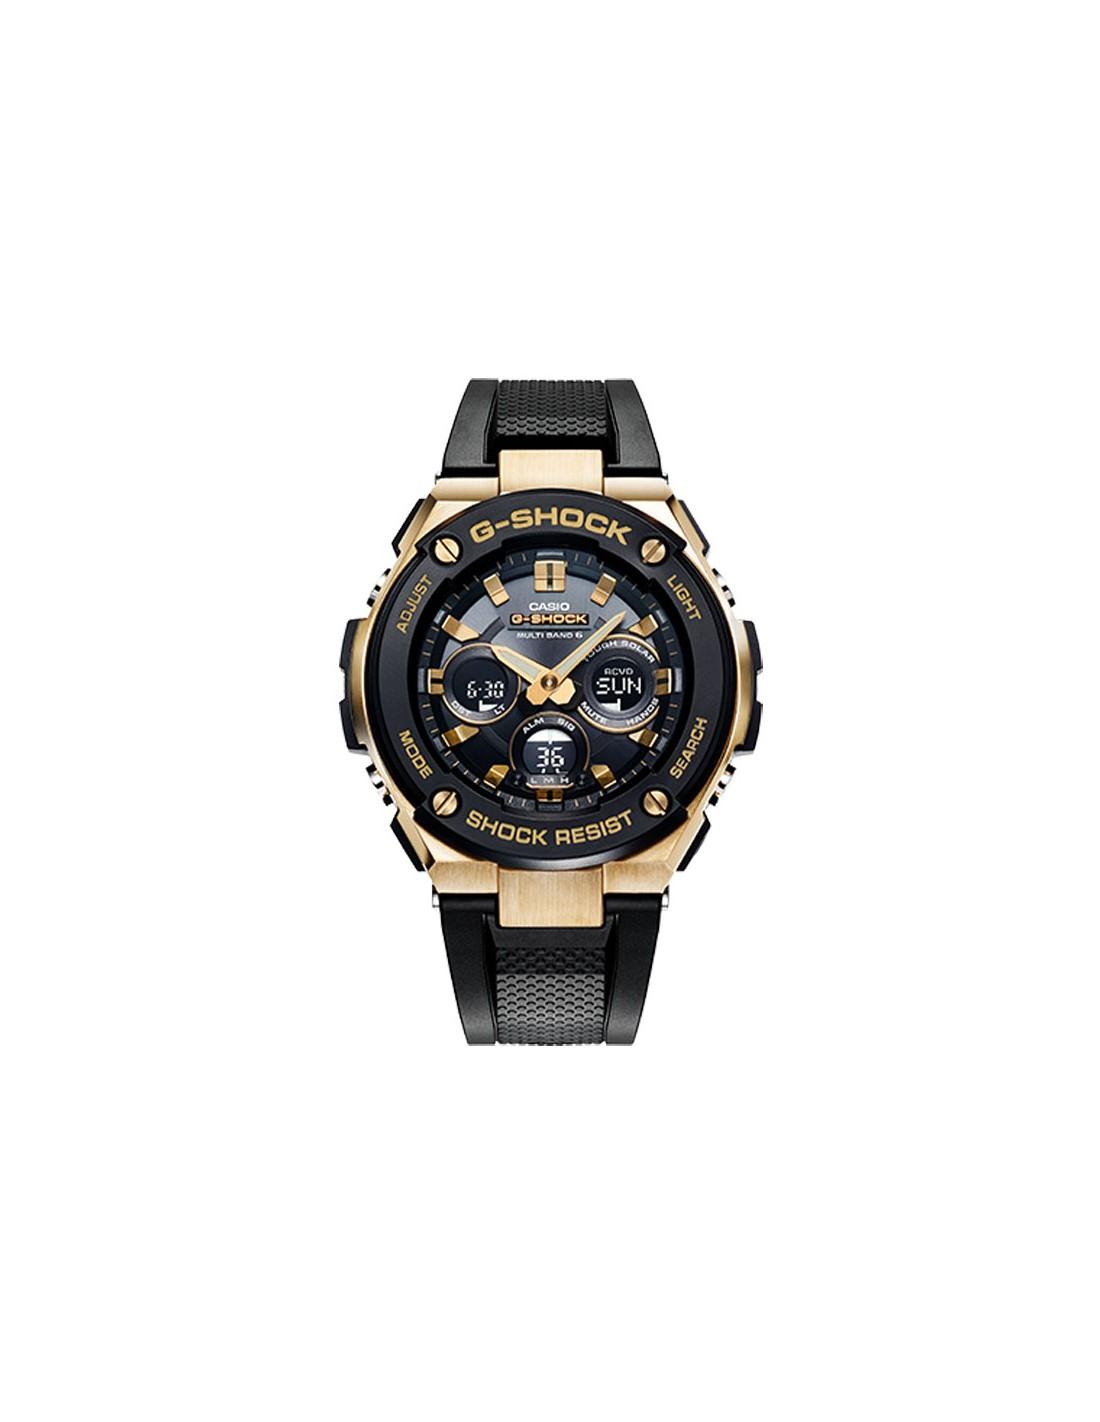 2e711b095875 Reloj Casio G-Shock GST-W300G-1A9ER